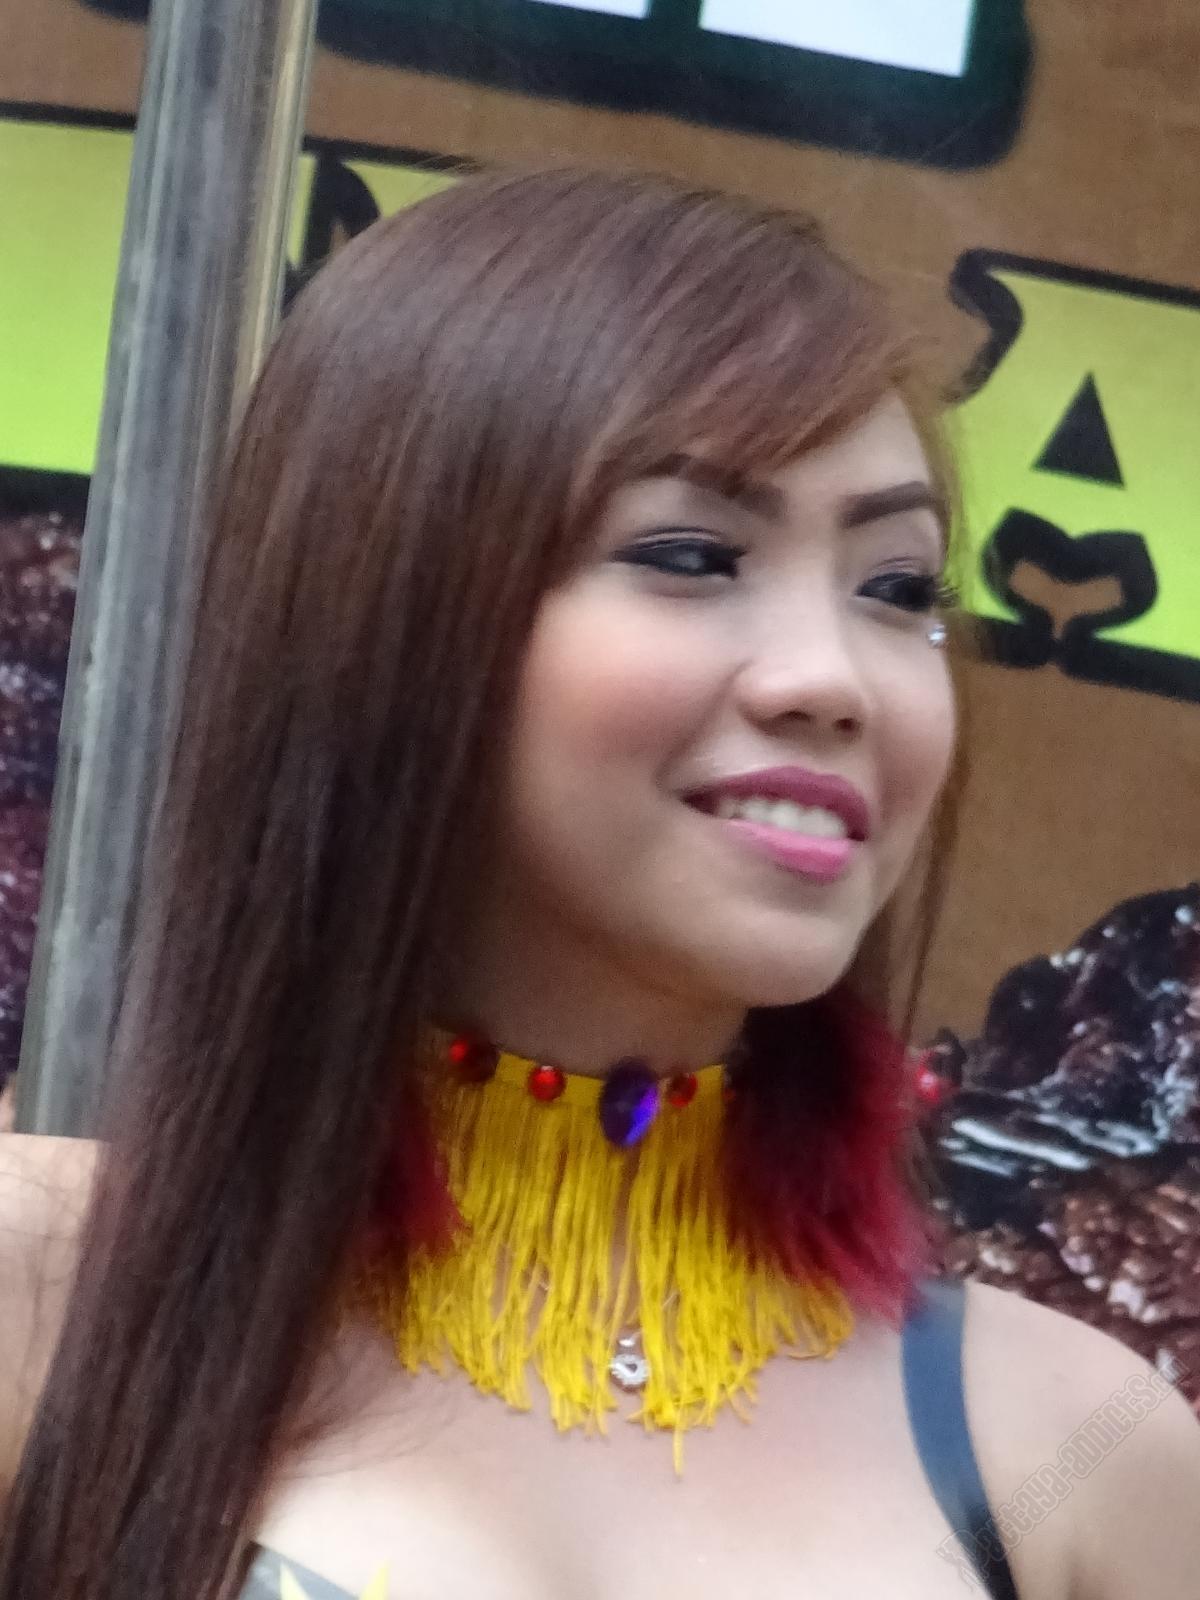 Filipina Bar Girl Photos 2014 - Page 4 - Philippines - Pattaya Addicts Forum-2207